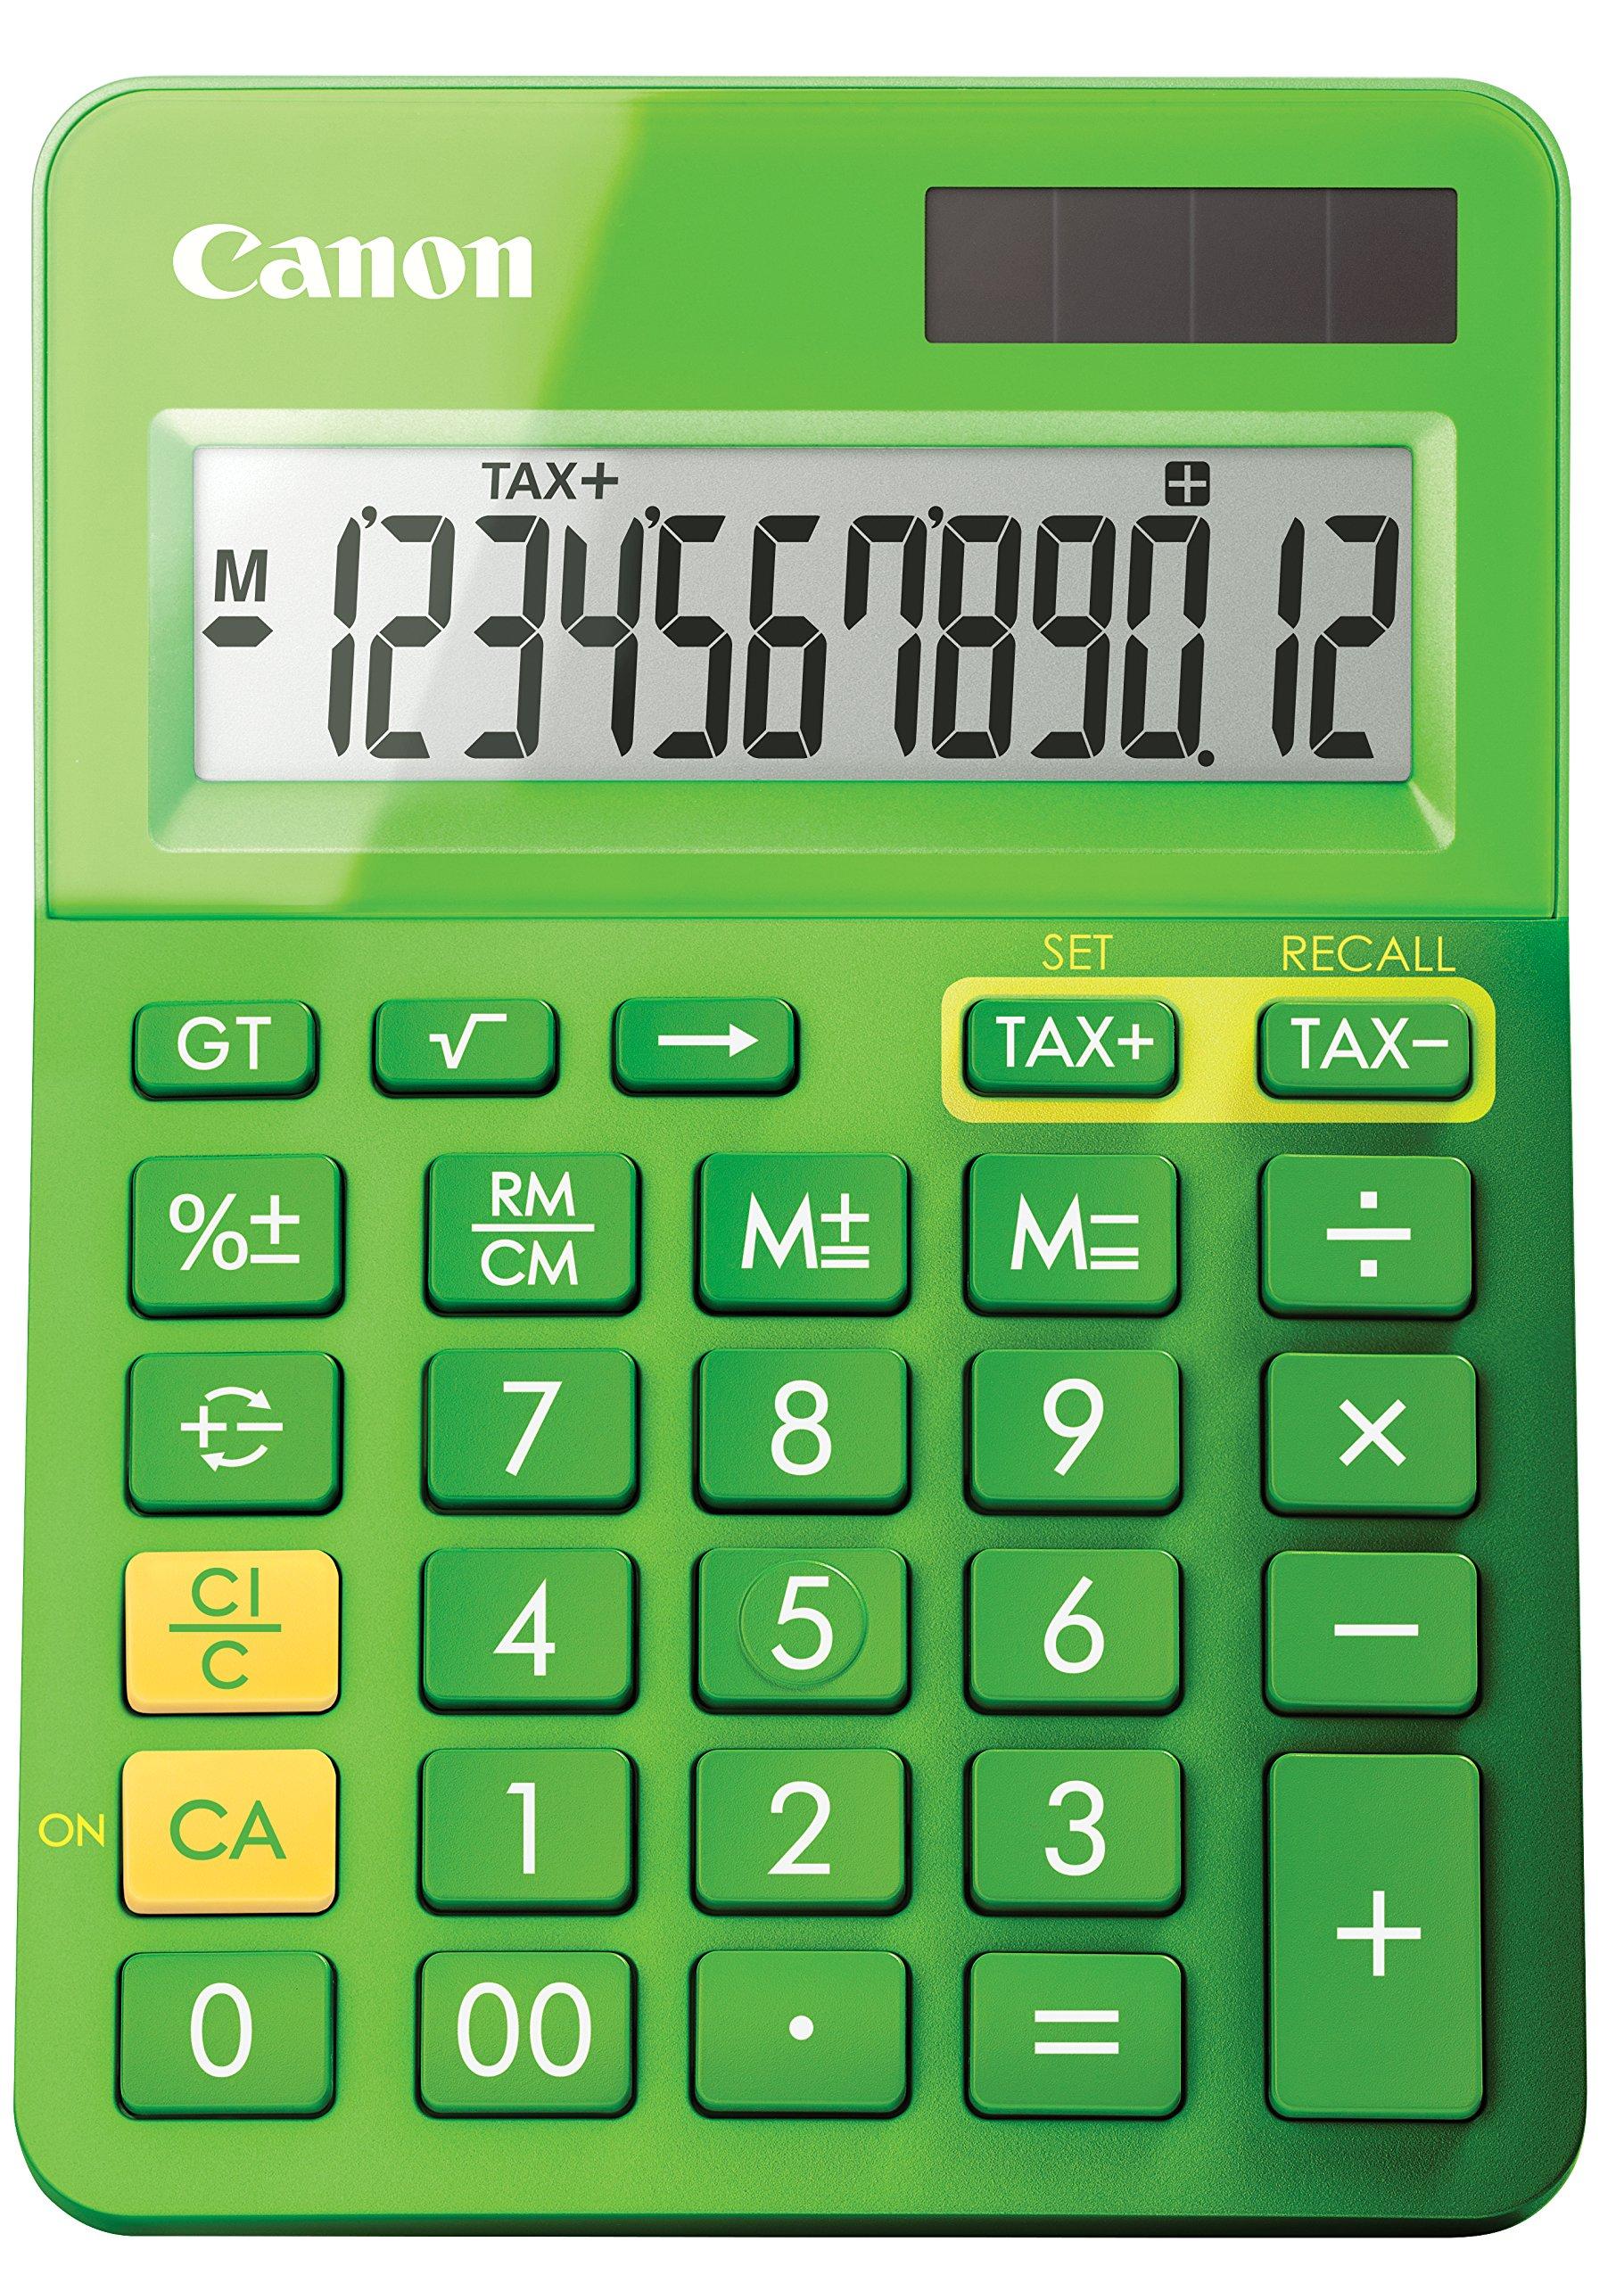 Canon Office Products 9490B017 LS-123K Desktop Basic Calculator, Metallic Green